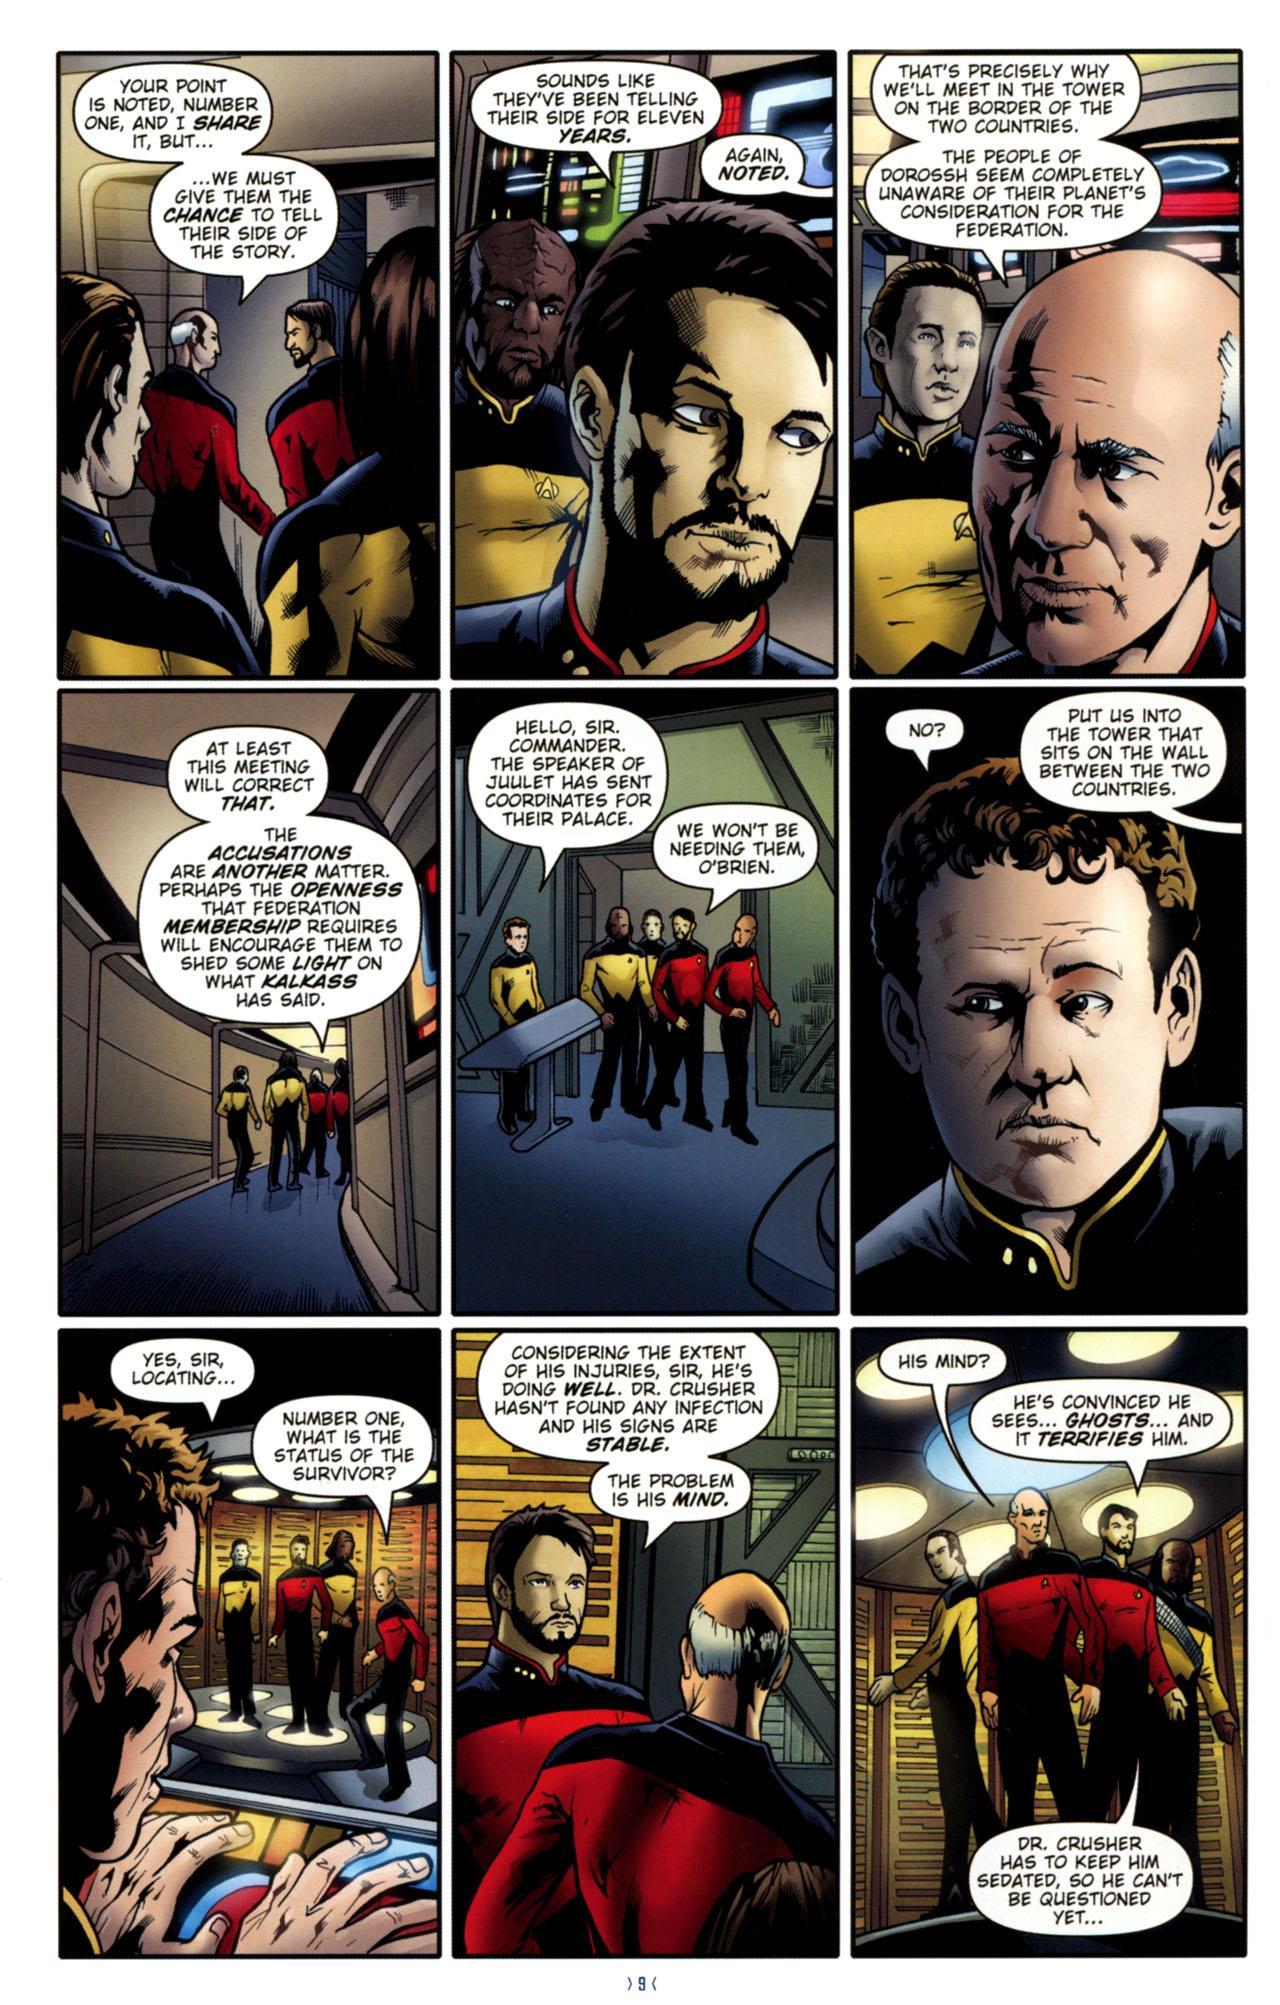 Star Trek TNG Ghosts review